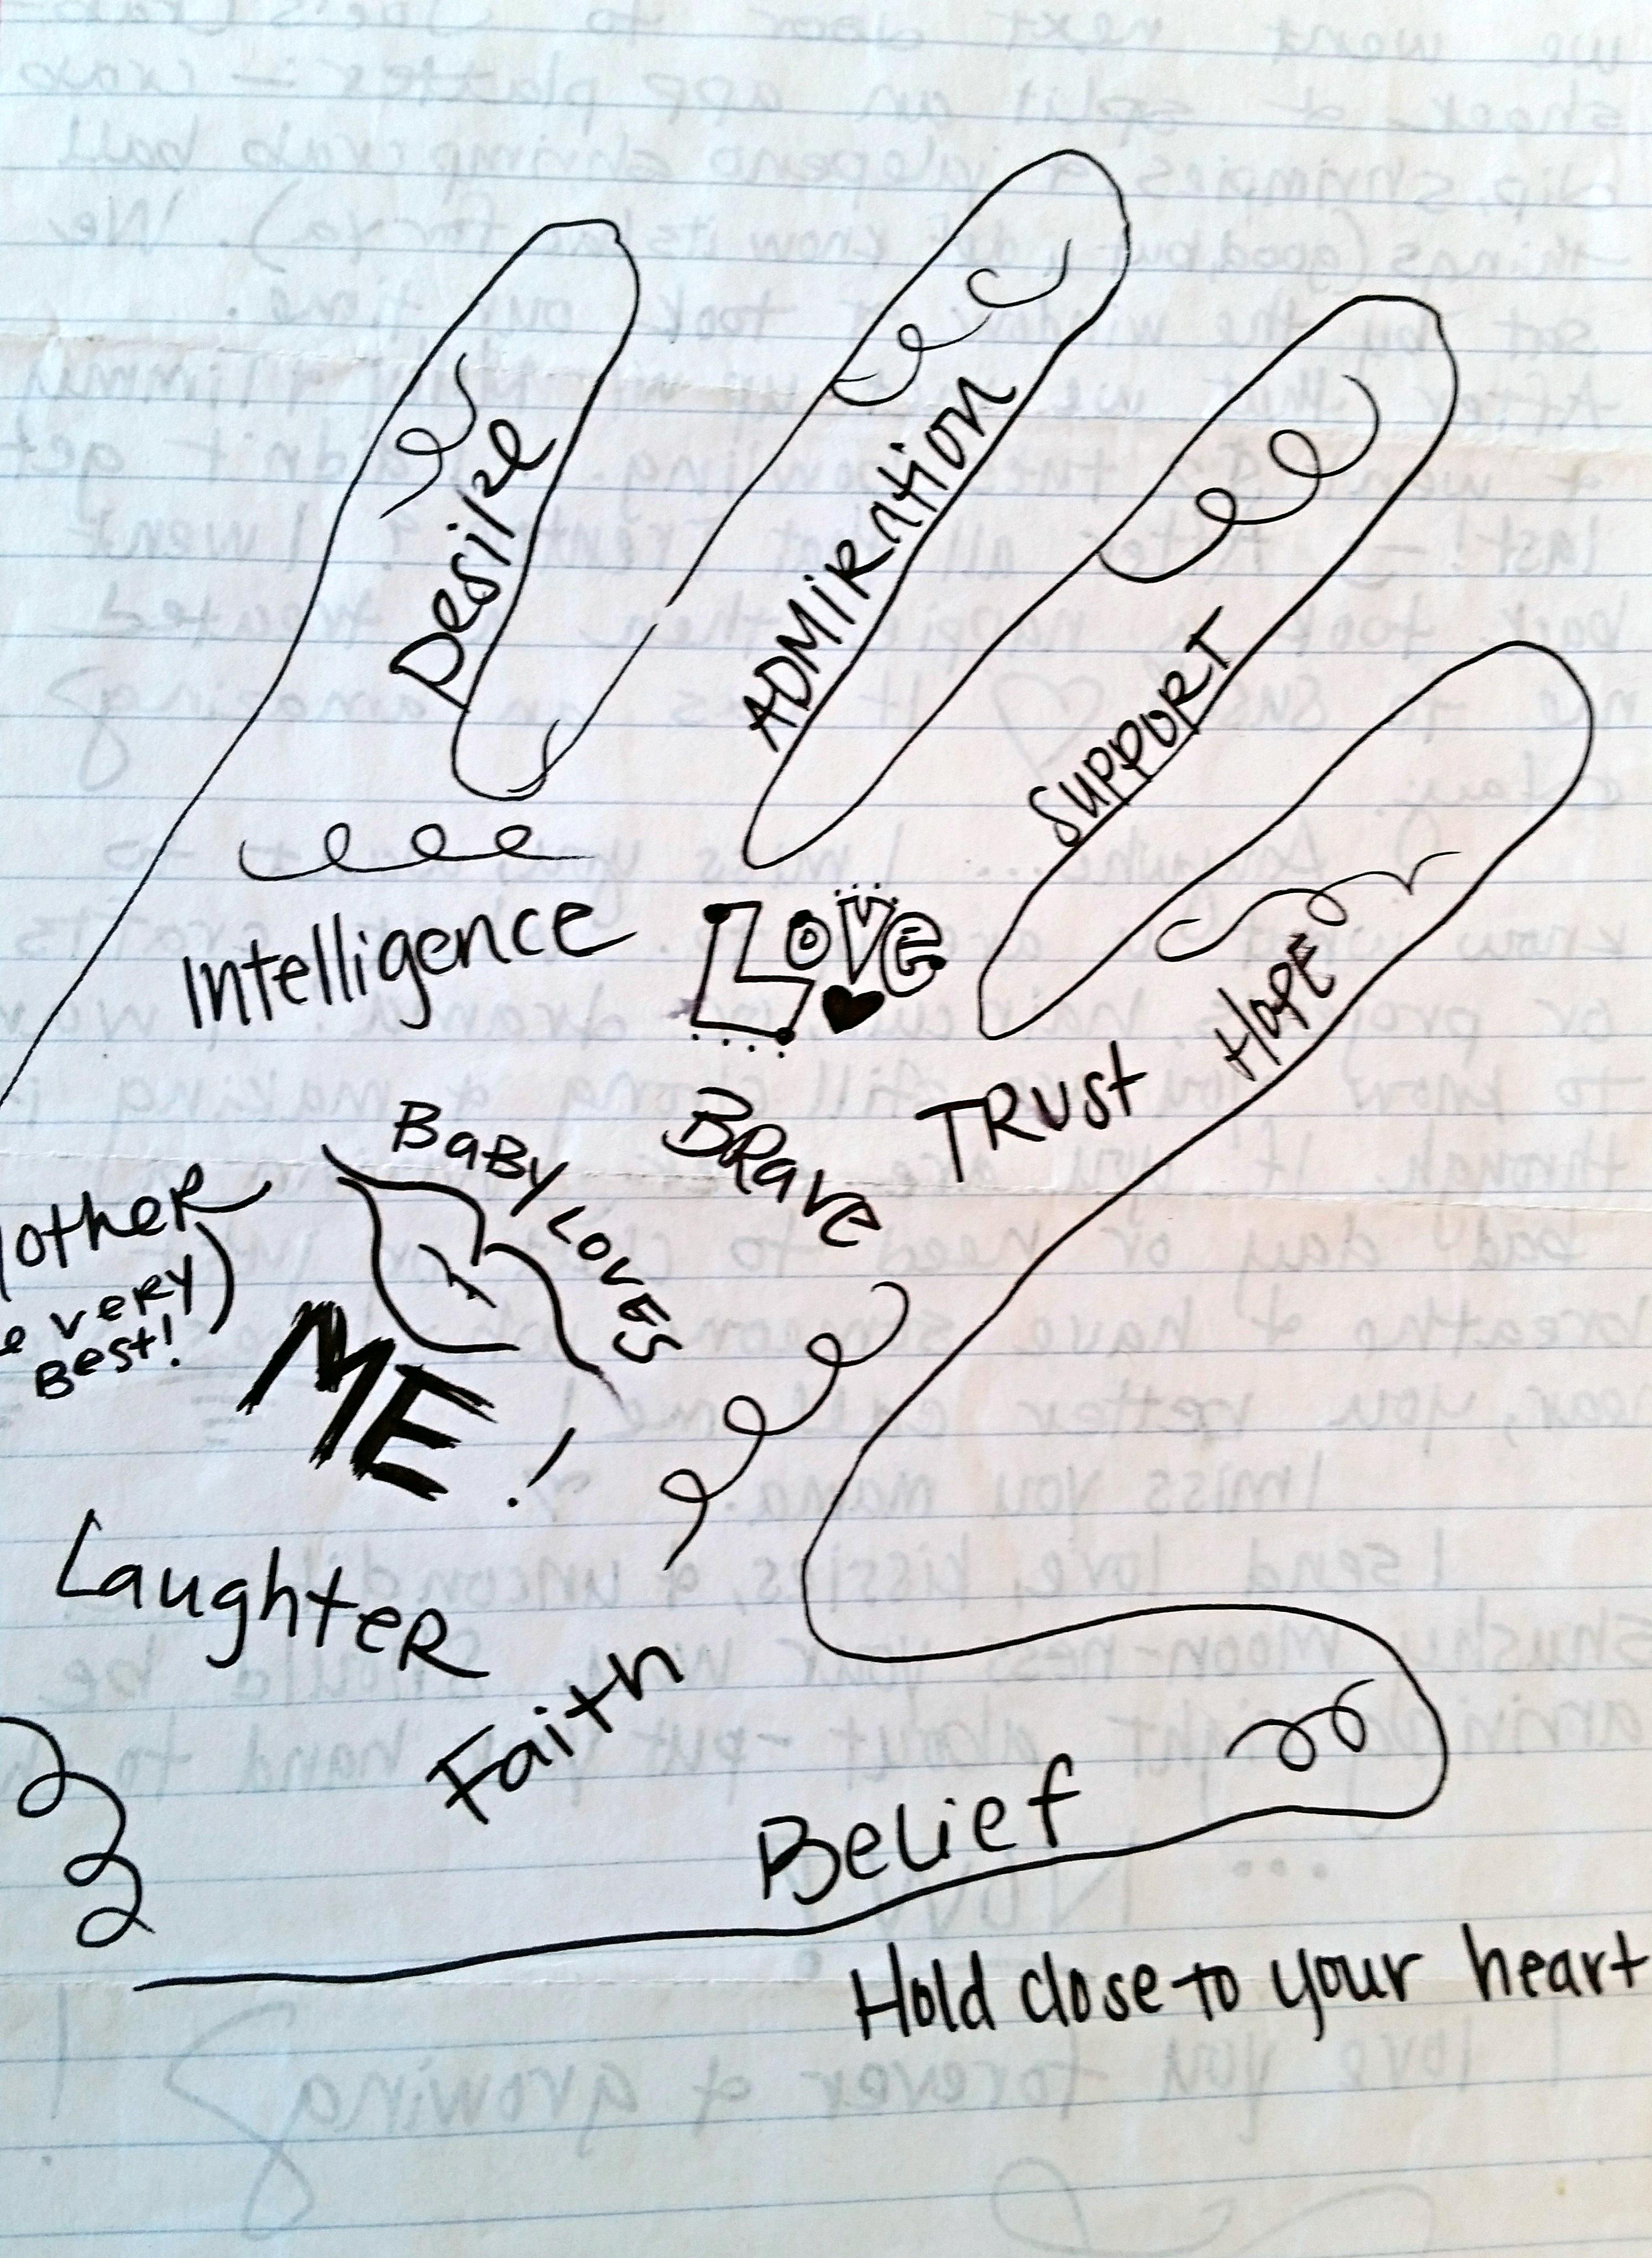 Haley Hand Drawing Karen Kampbell Writes